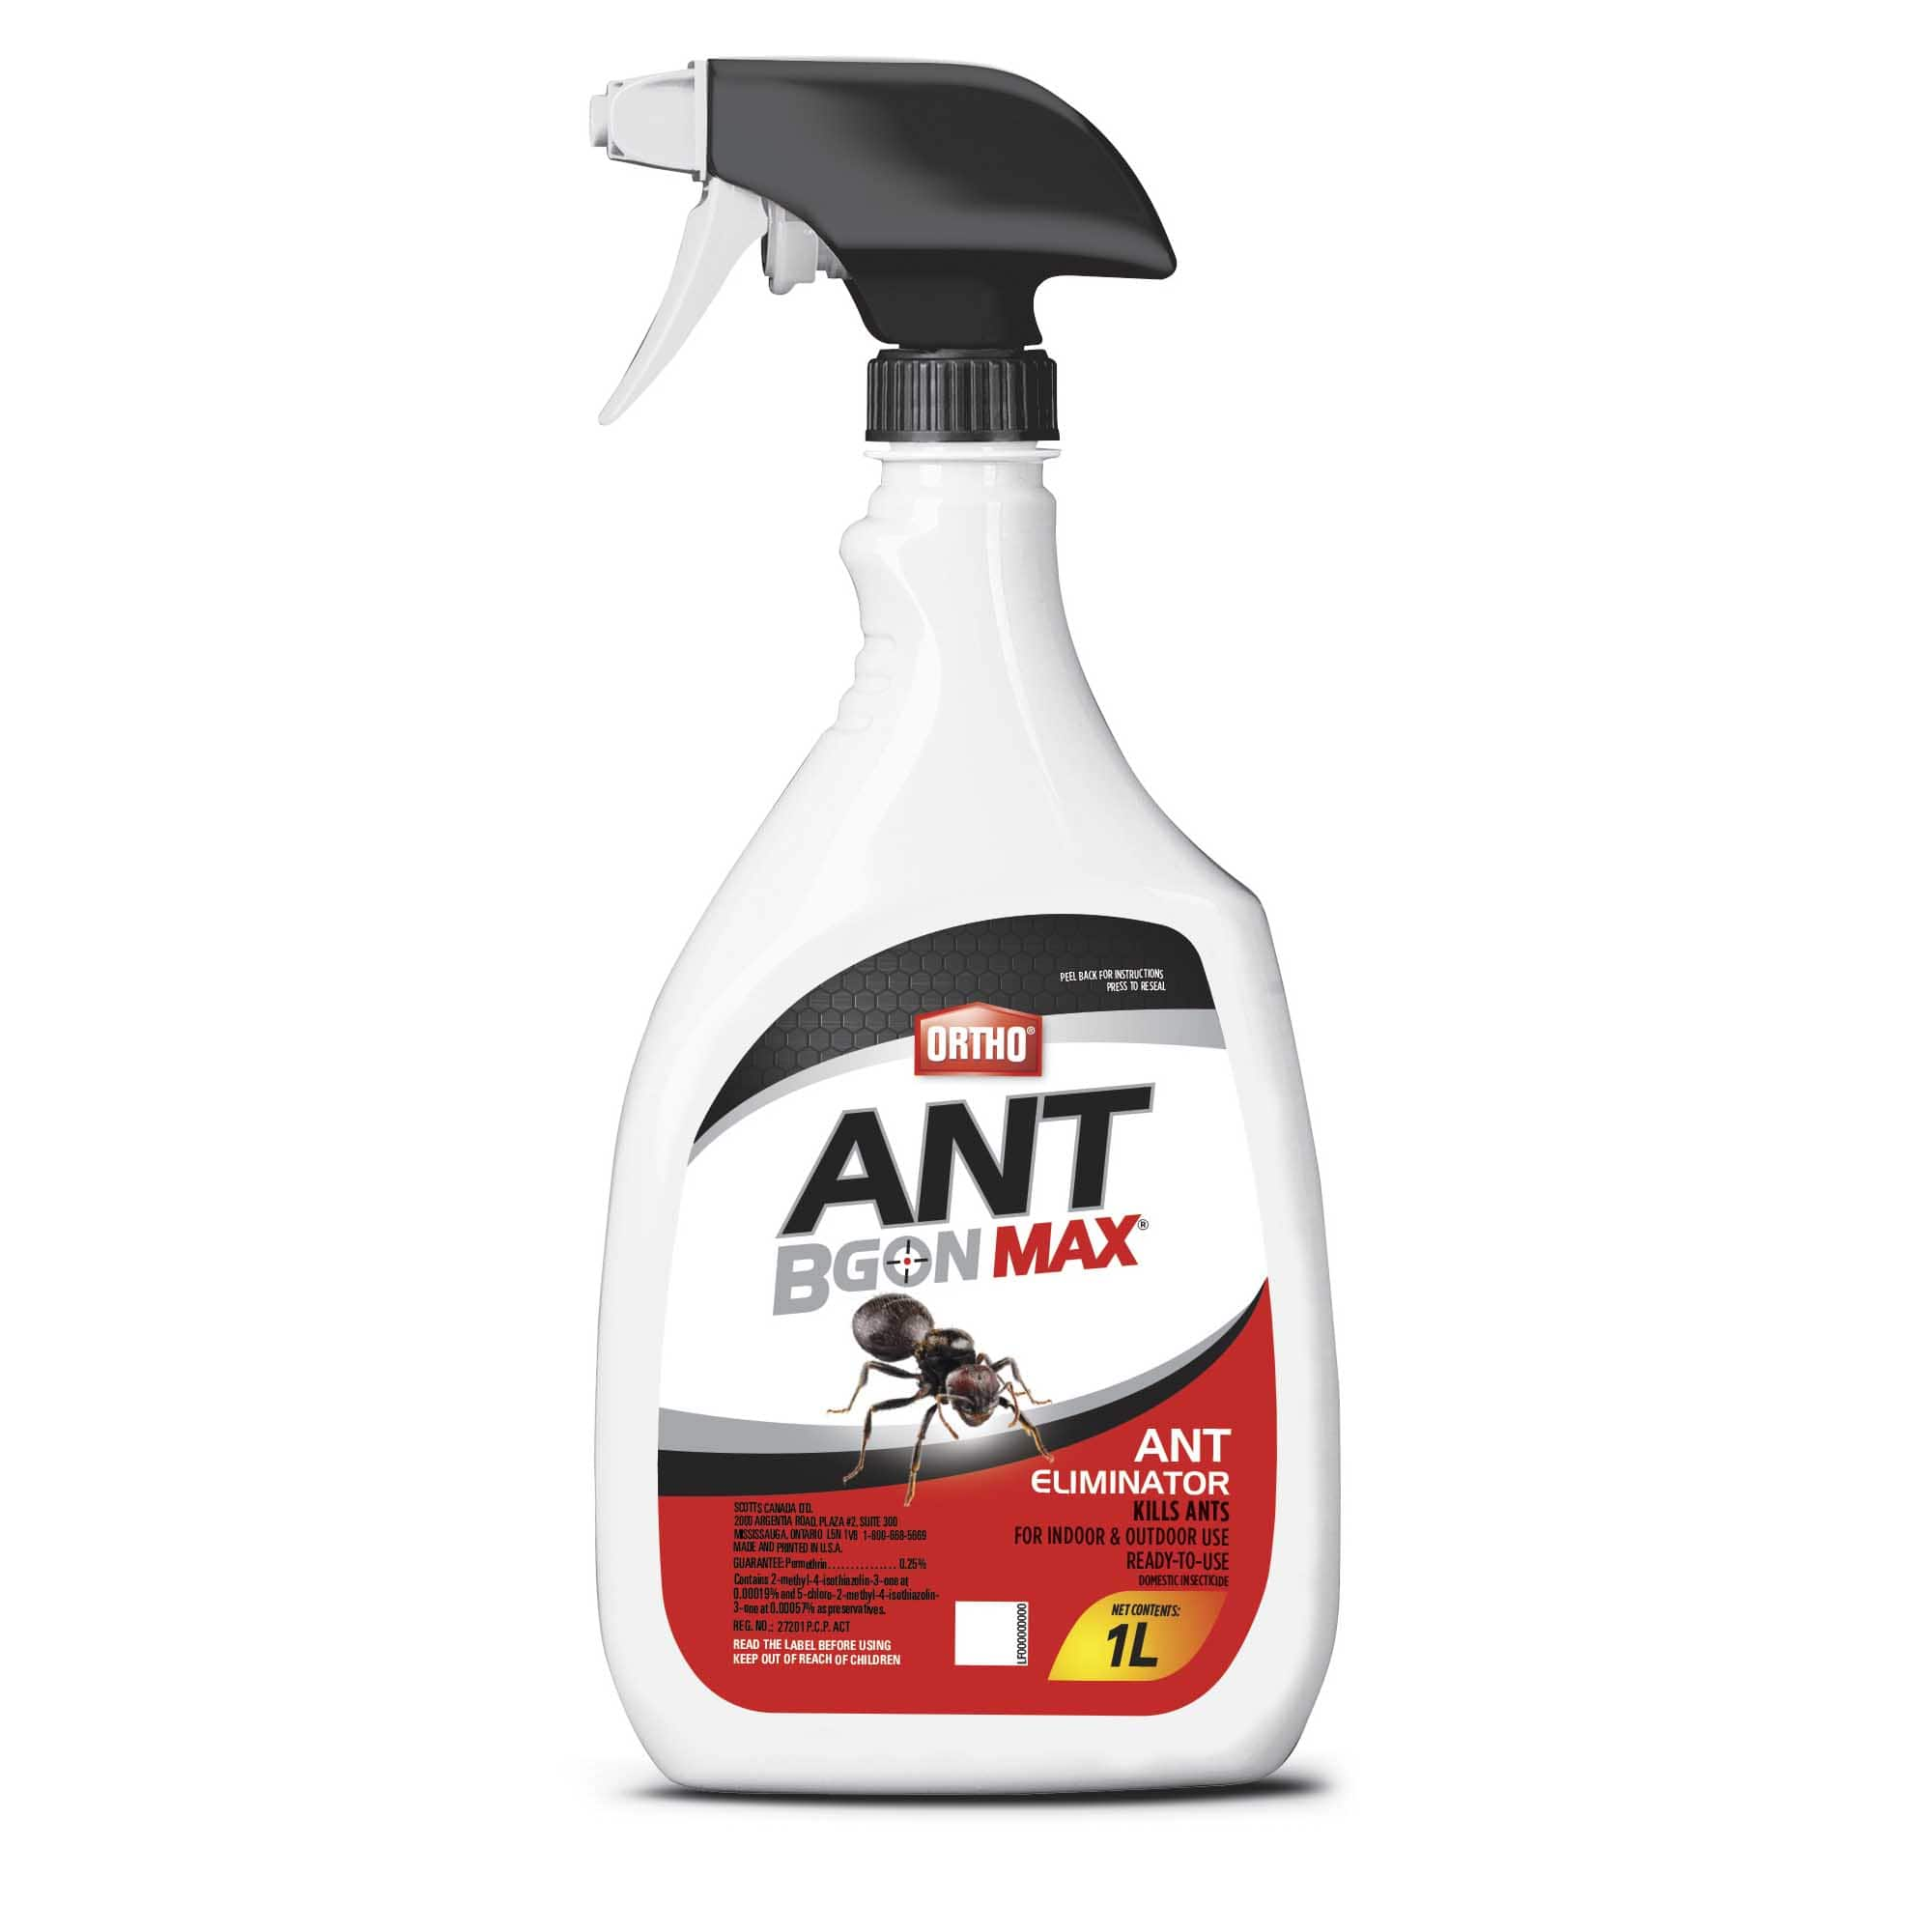 Ants-Be-Gone Spray